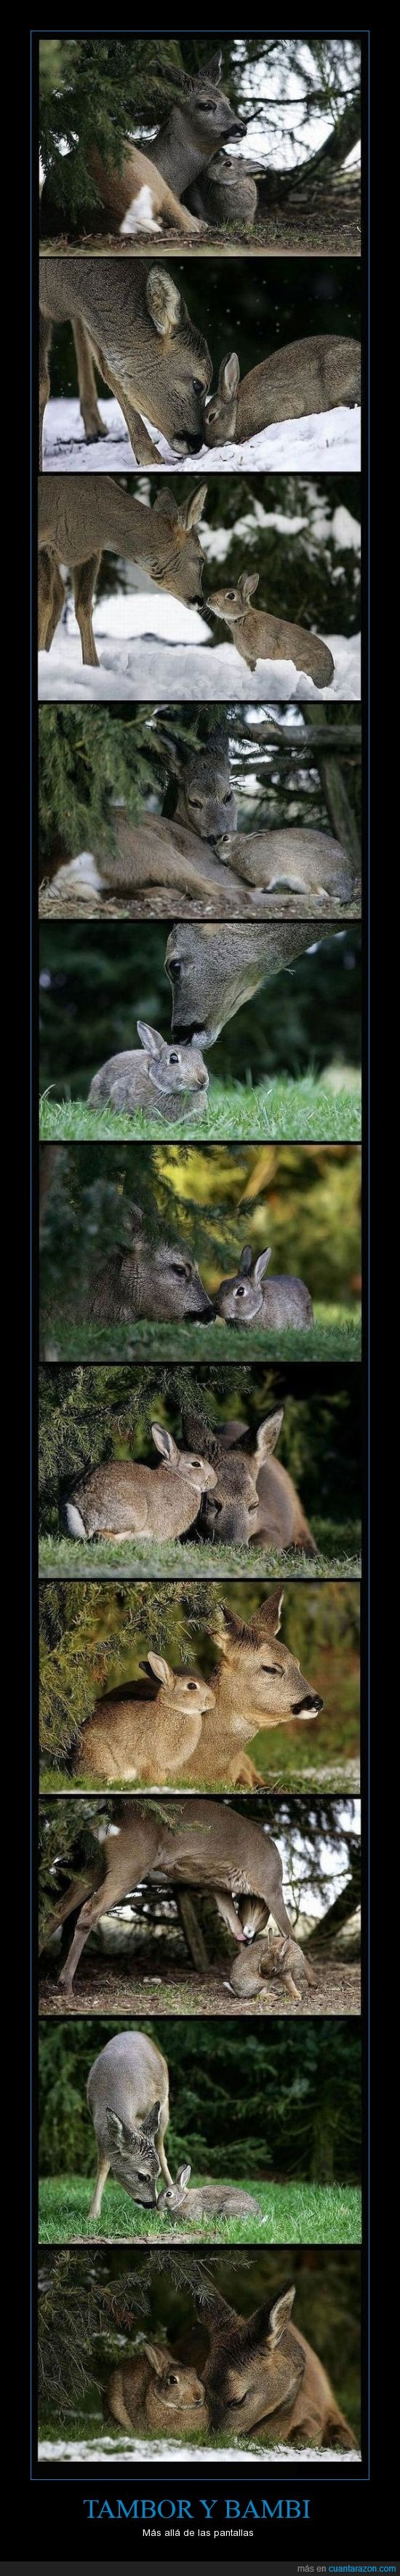 amistad,bambi,cariño,realidad,tambor